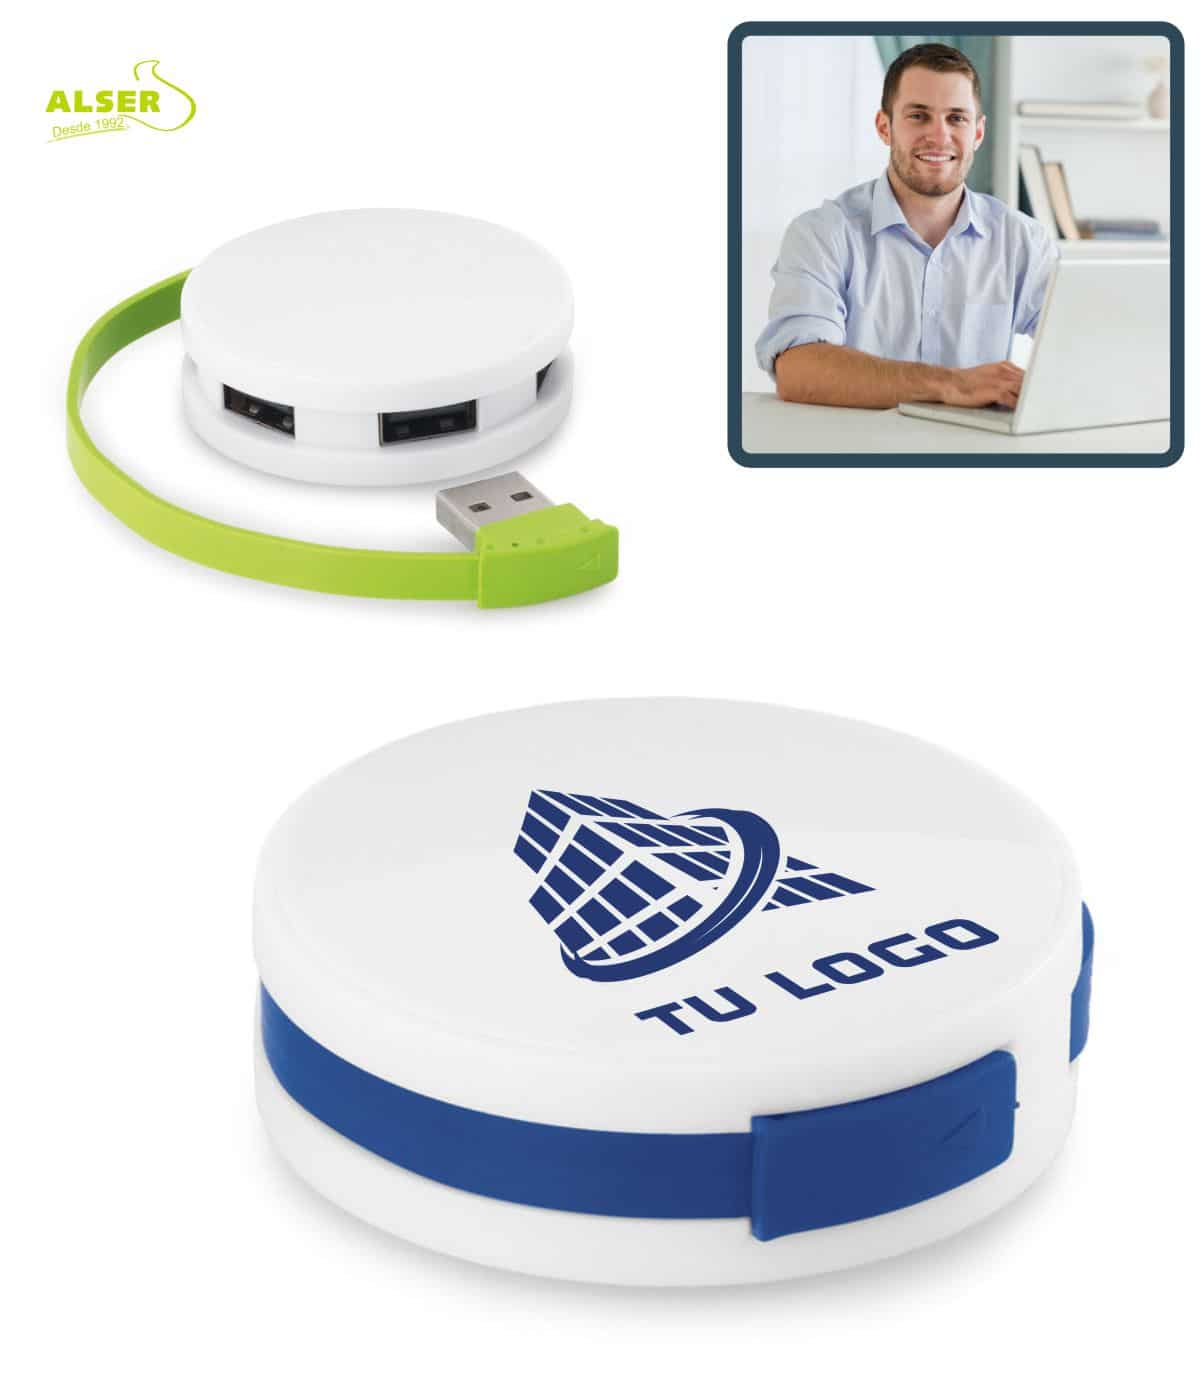 Pack fundamental de teletrabajo. Hub USB